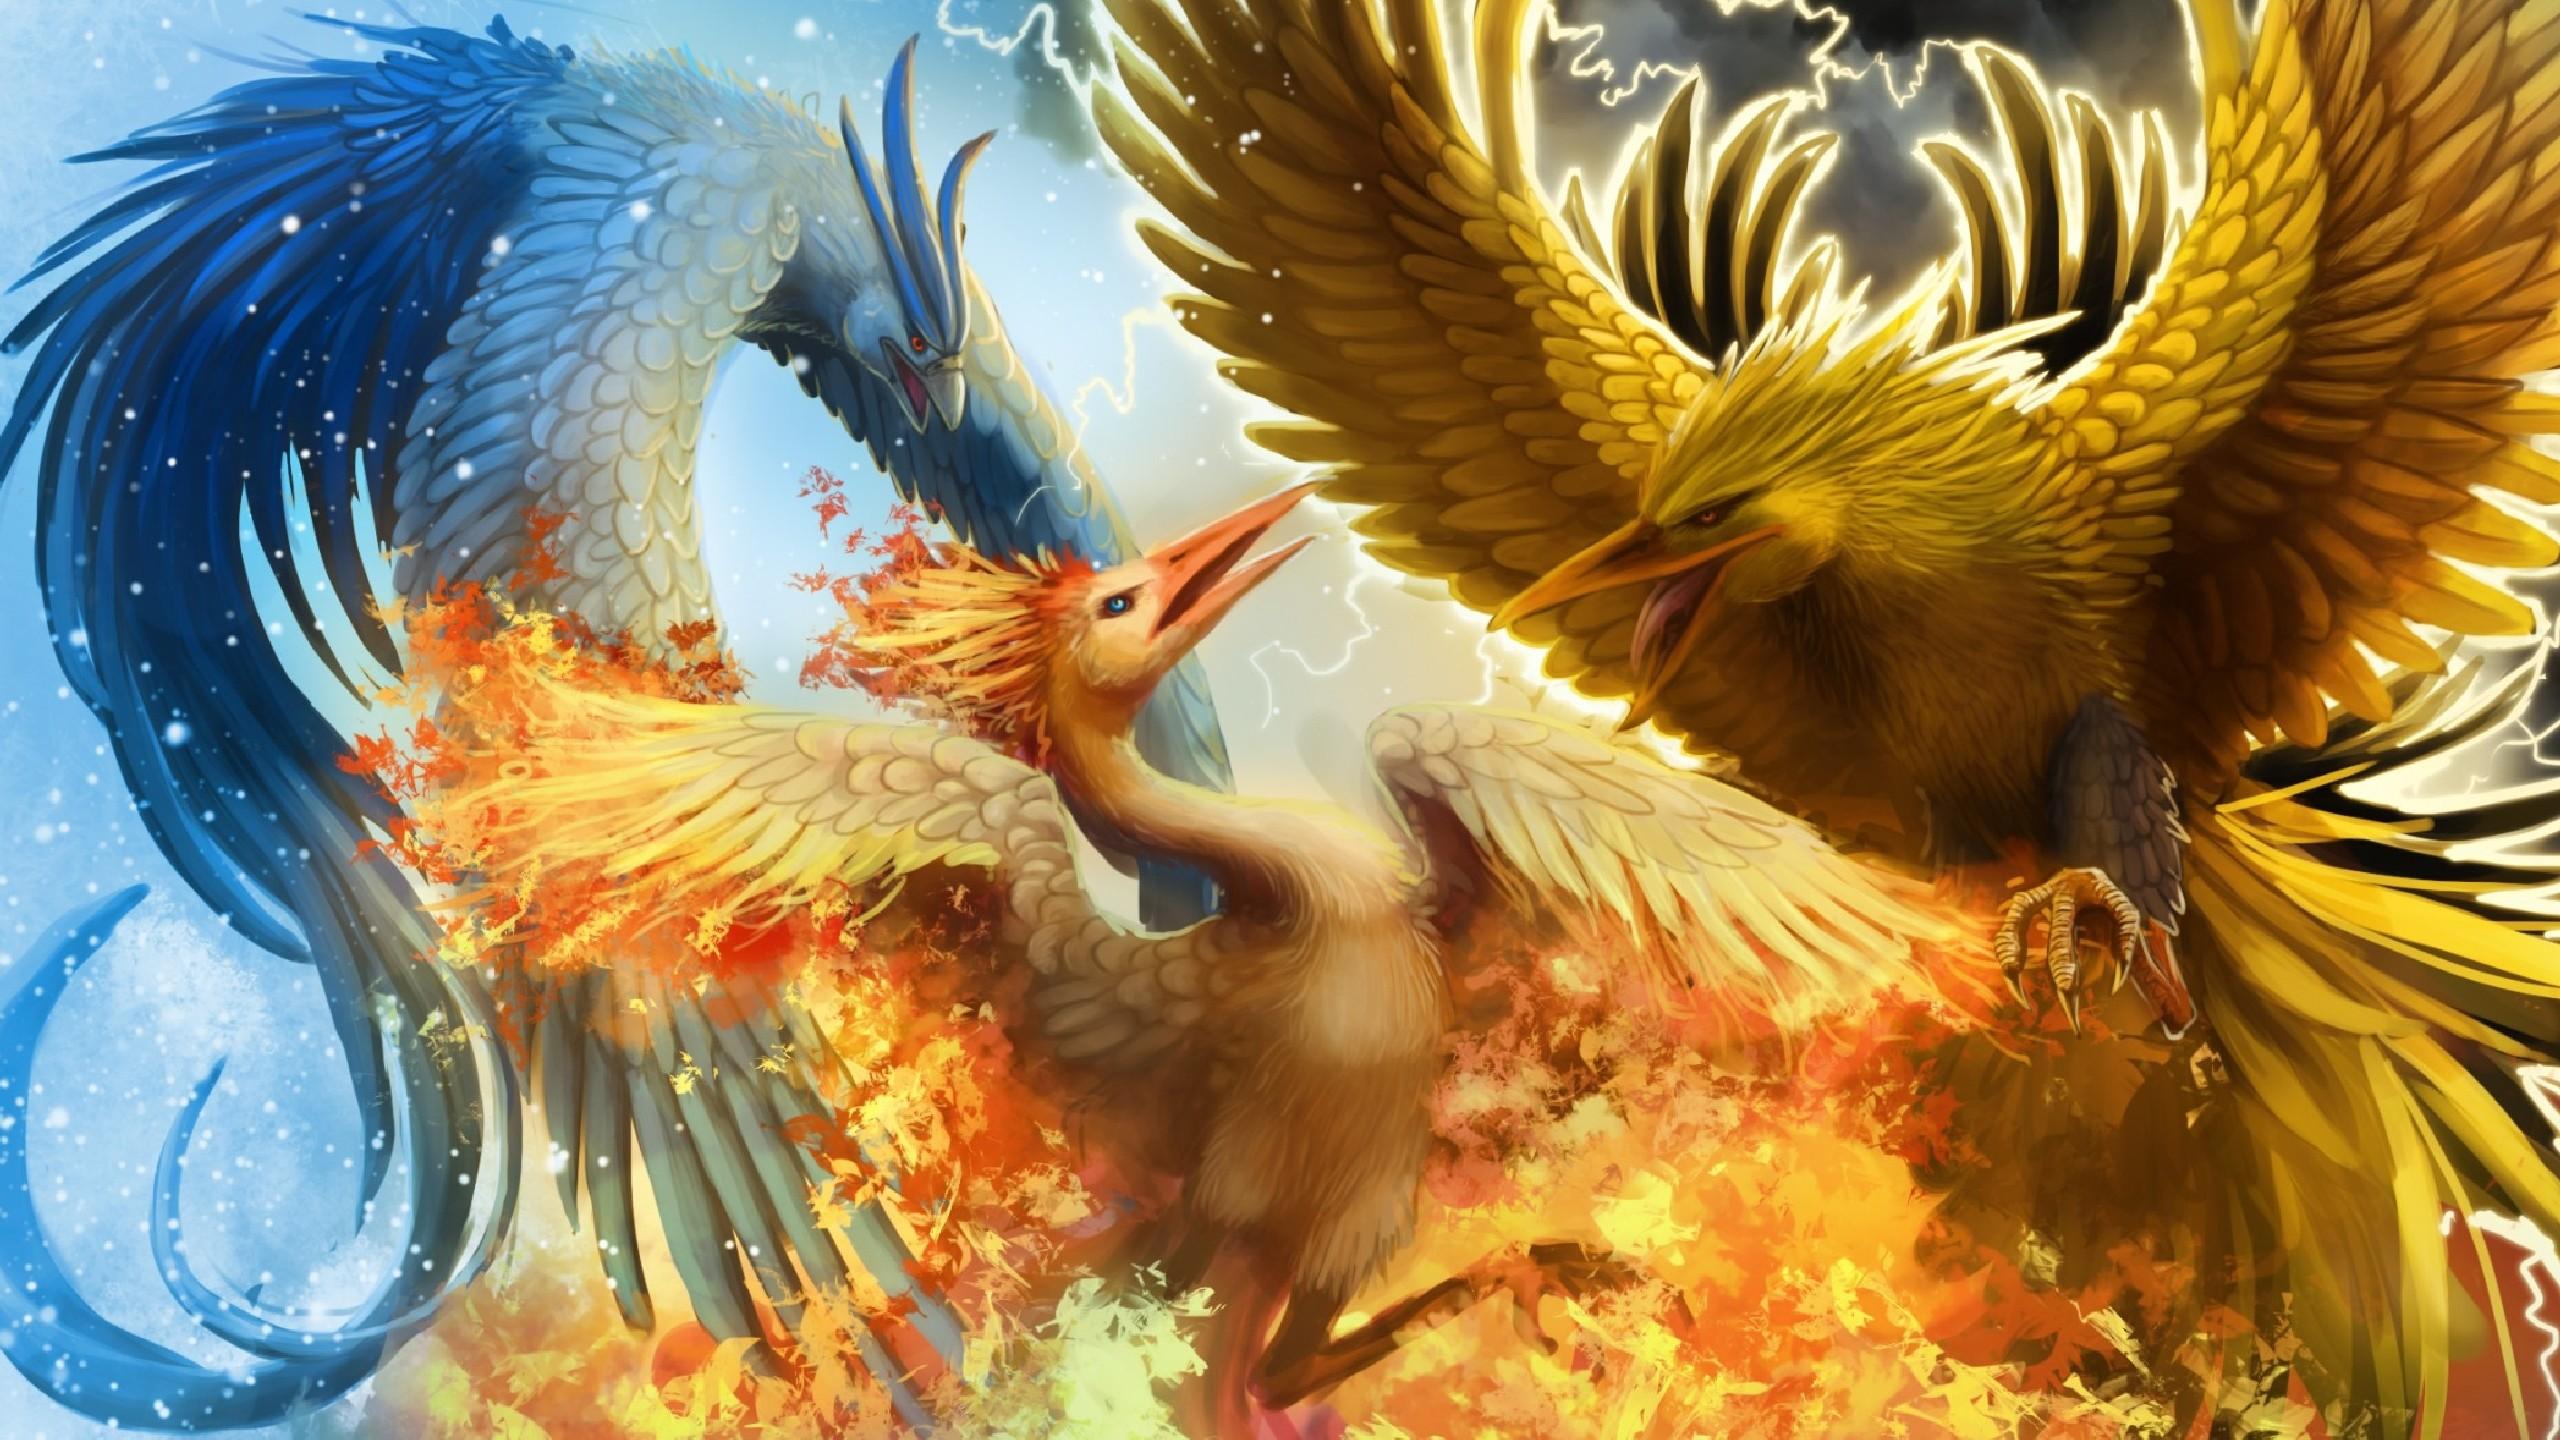 71 Legendary Pokemon Wallpapers on WallpaperPlay 2560x1440